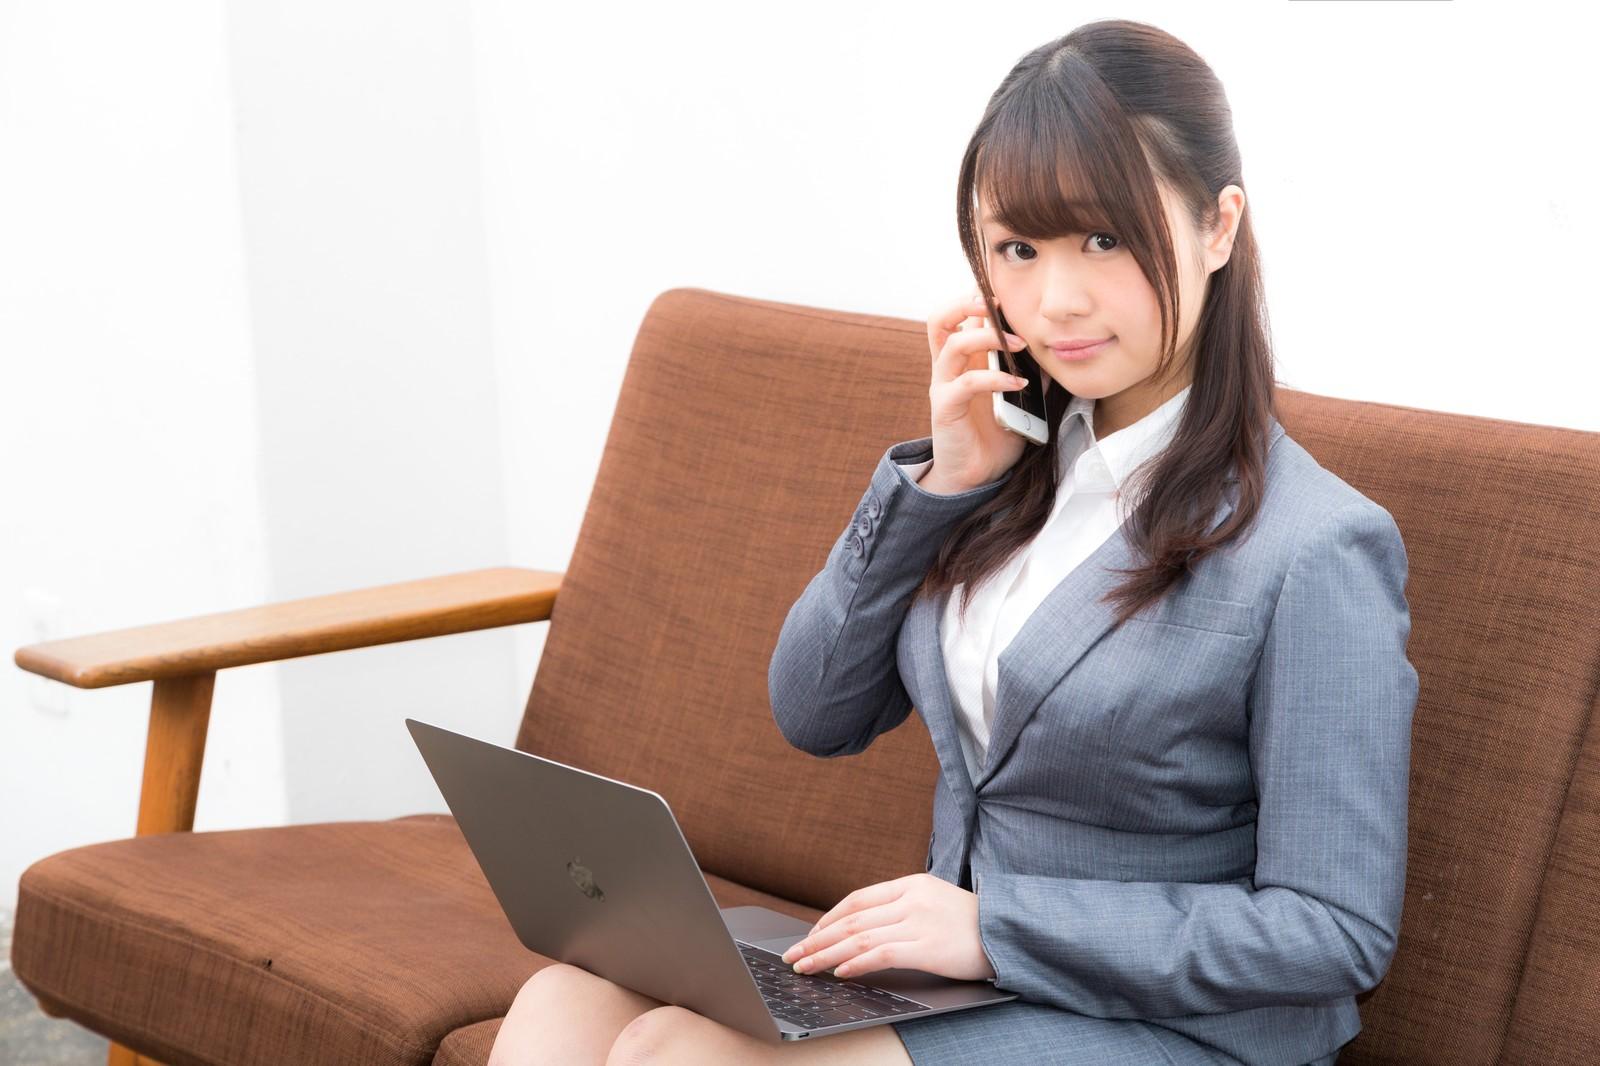 IT業界の営業に転職するのに必要な5つのステップ【アピールポイント、仕事内容スキル】